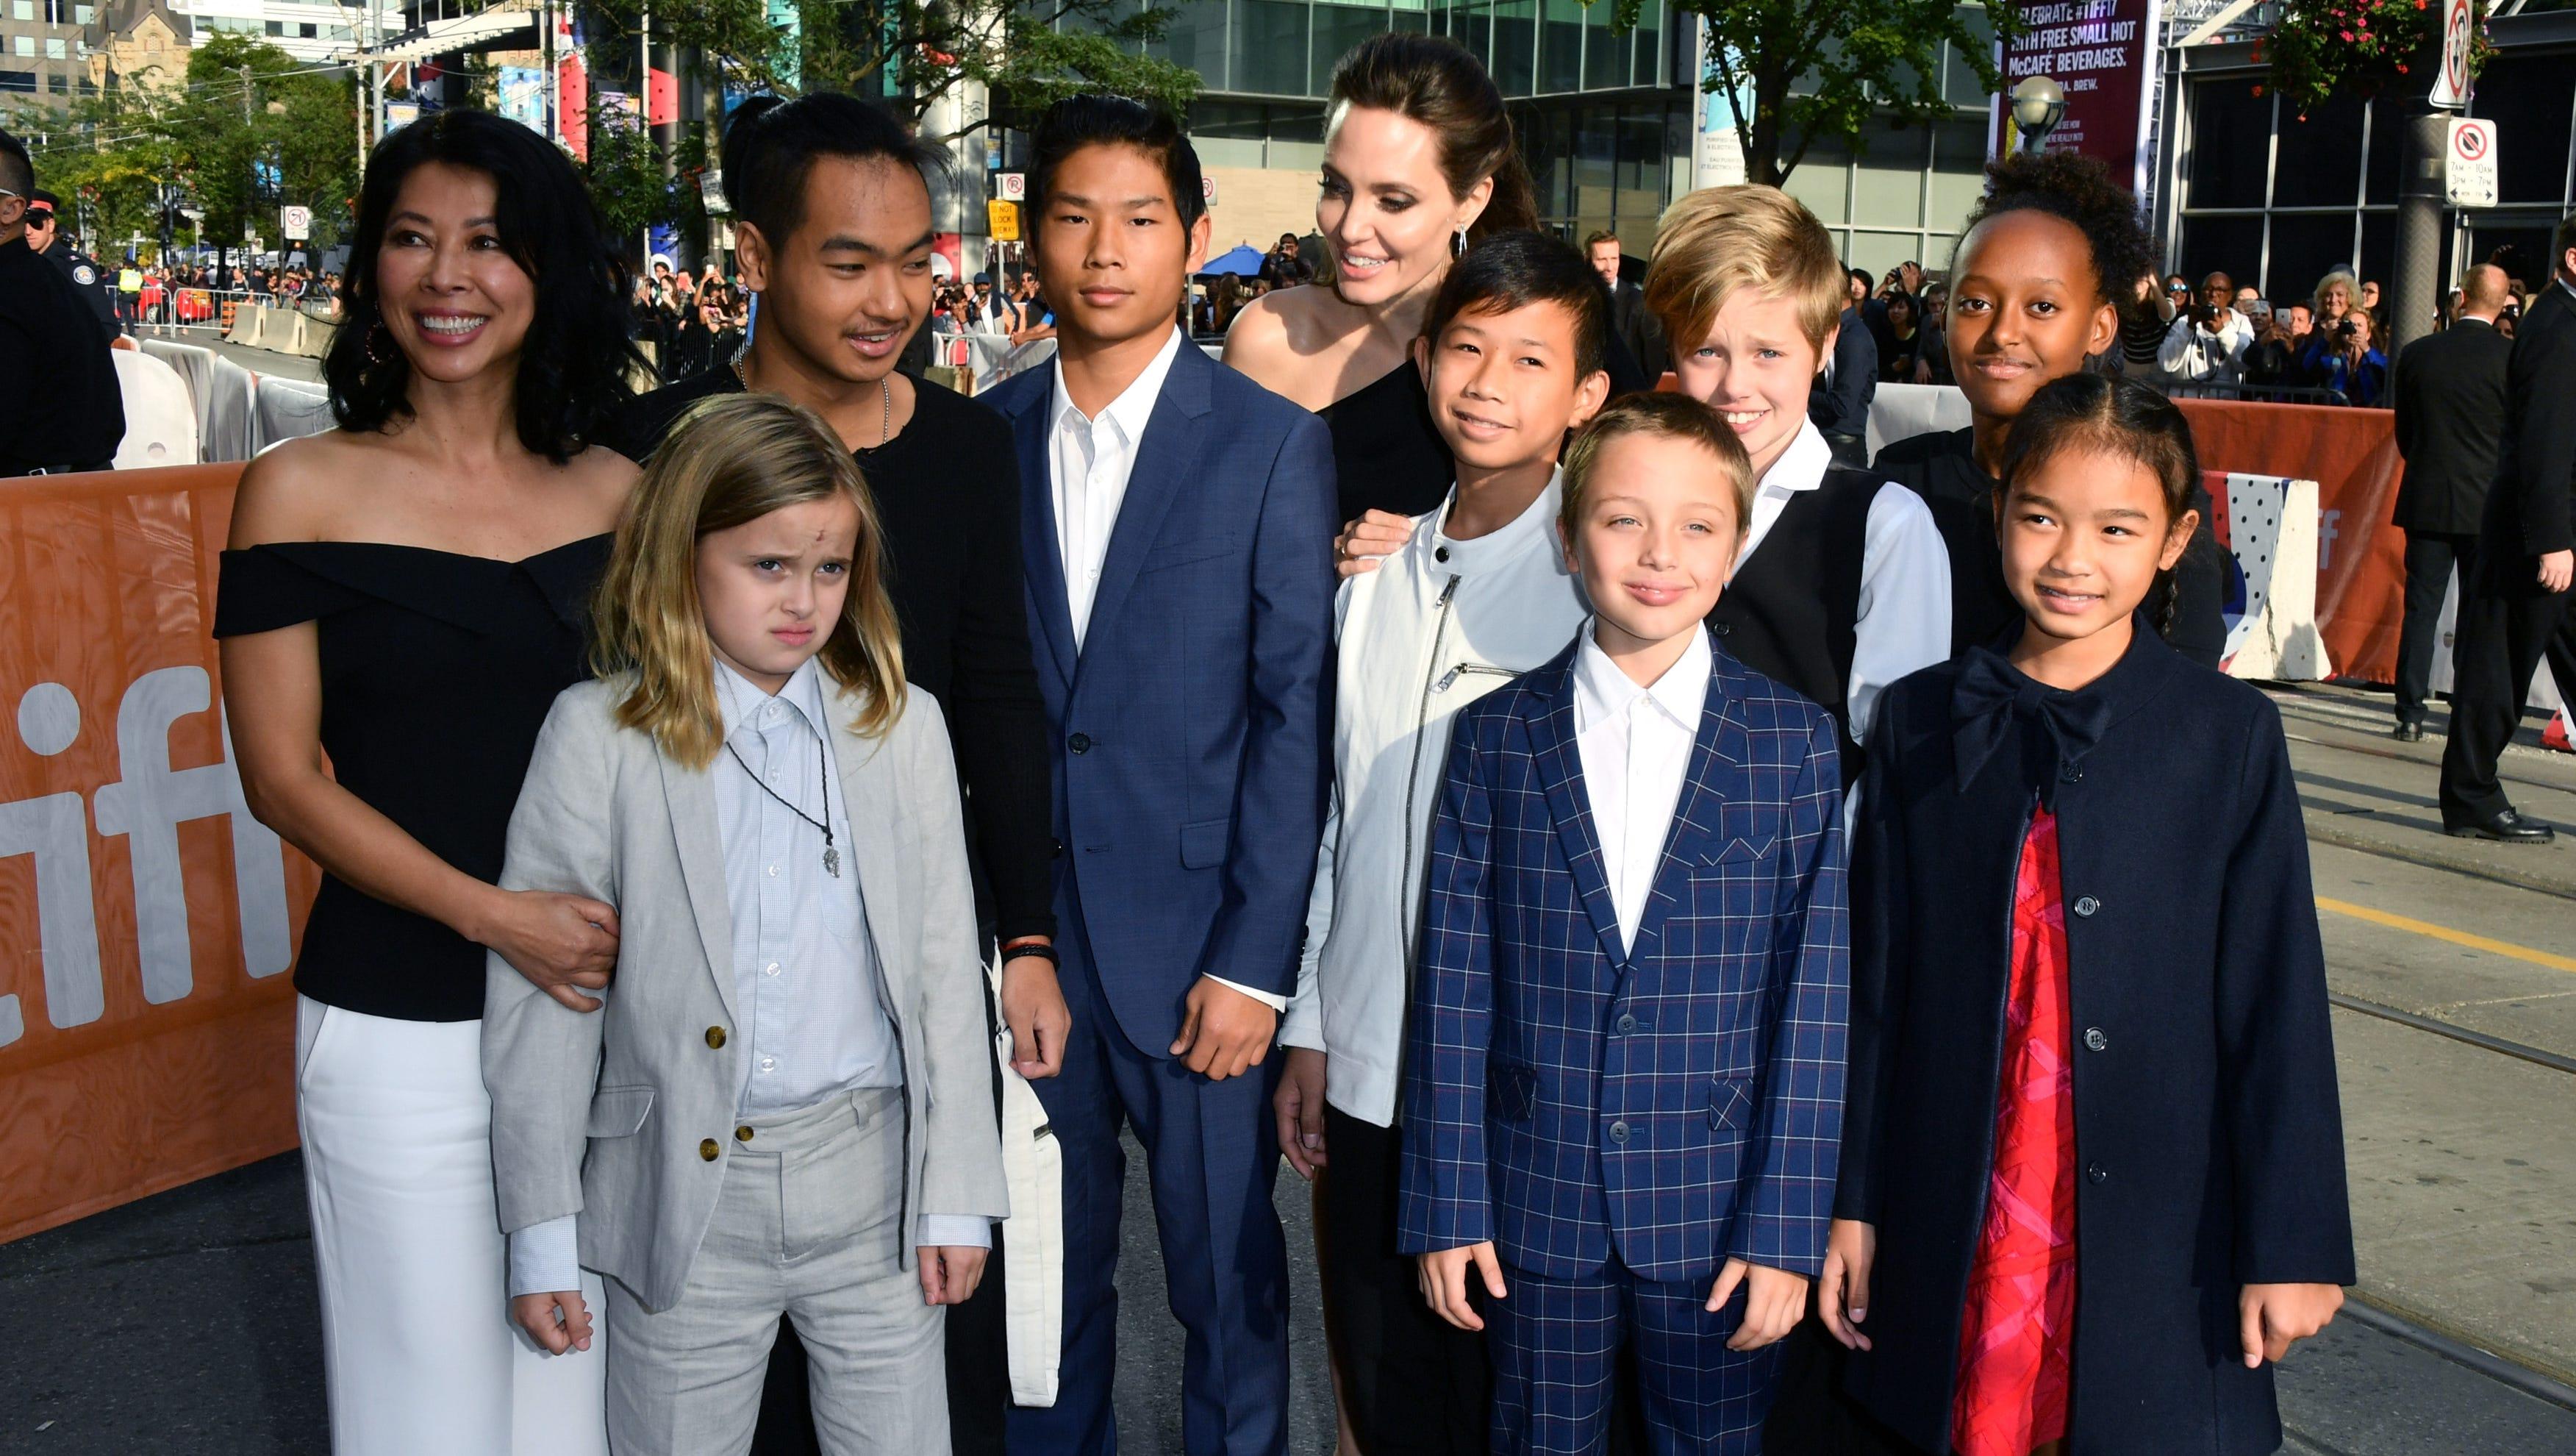 Angelina Jolie with her 6 kids